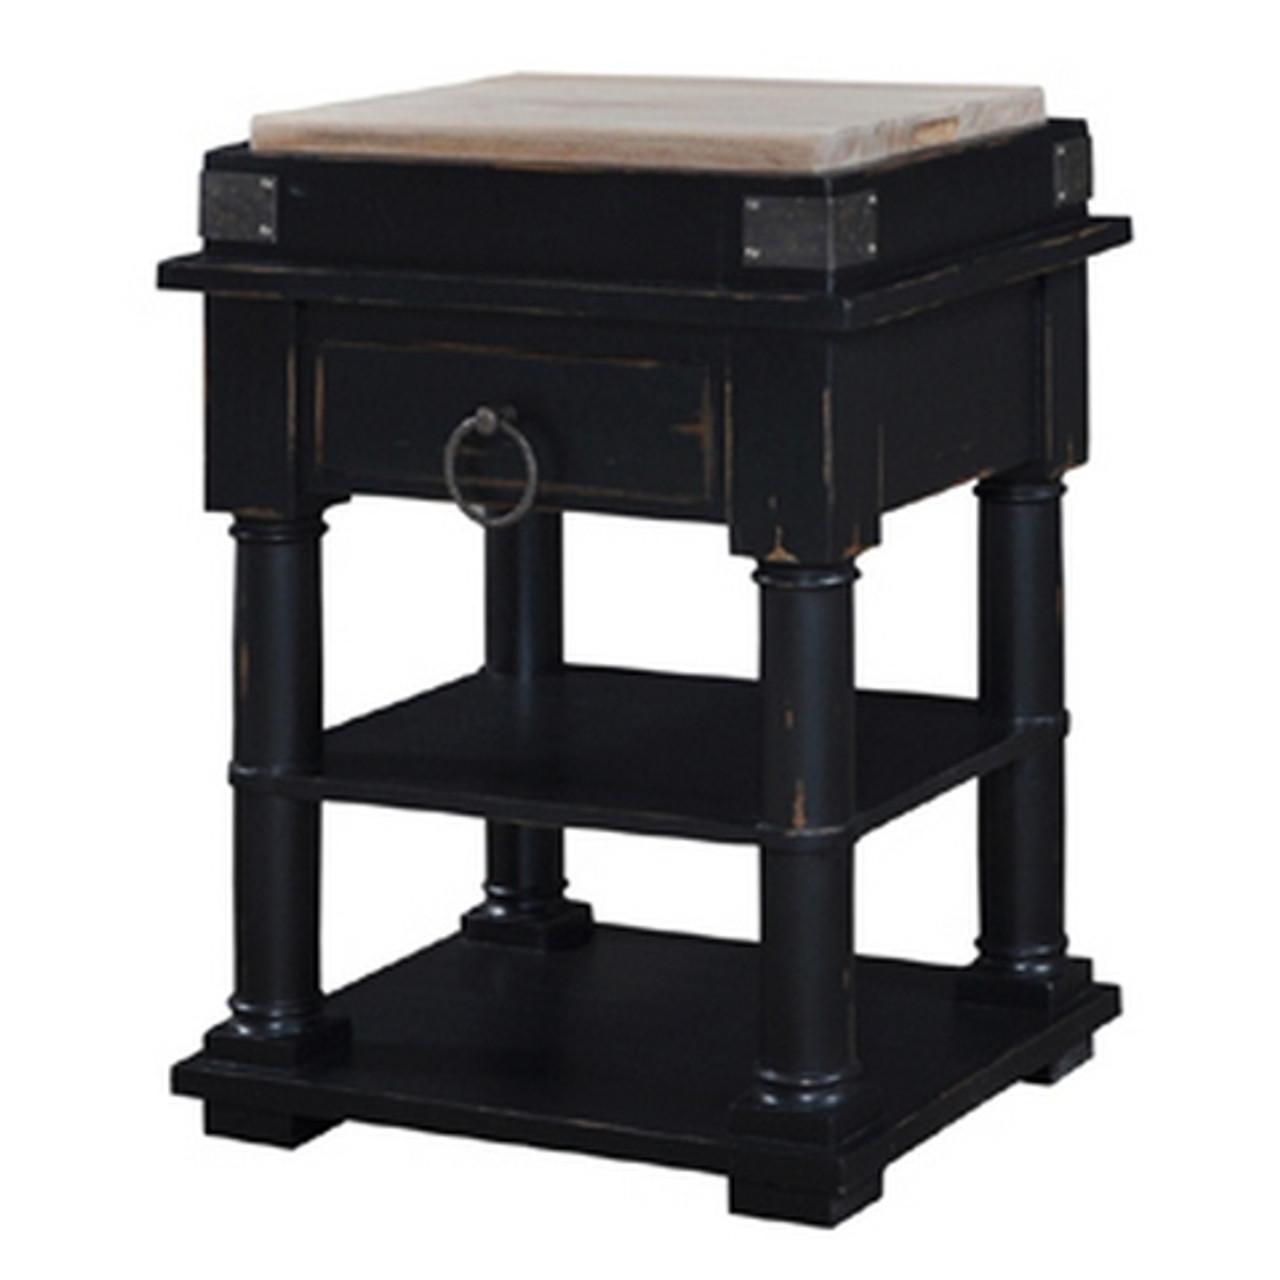 Cortland Kitchen Island On Coasters Size 90h X 70w X 60d Cm Furniture Kitchen Butcher Block